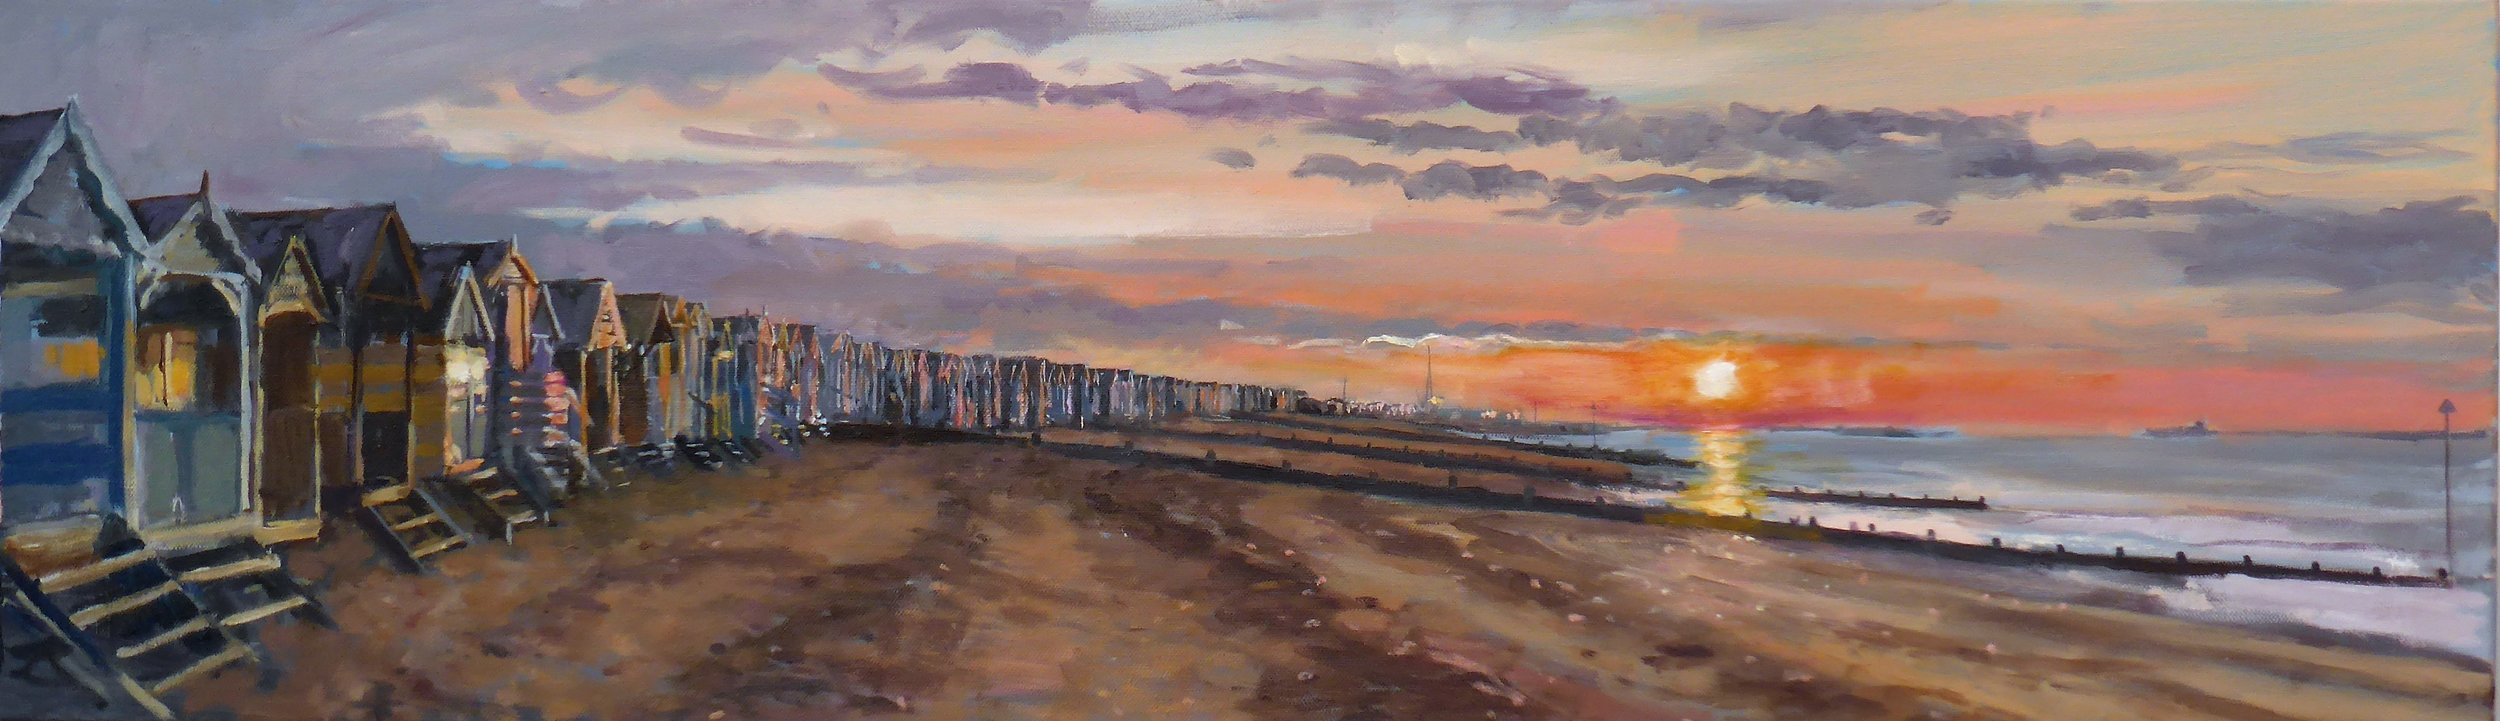 Thorpe Bay Sunrise and the Beachhuts.  Oil on Canvas 30cm x 100cm 2017.JPG